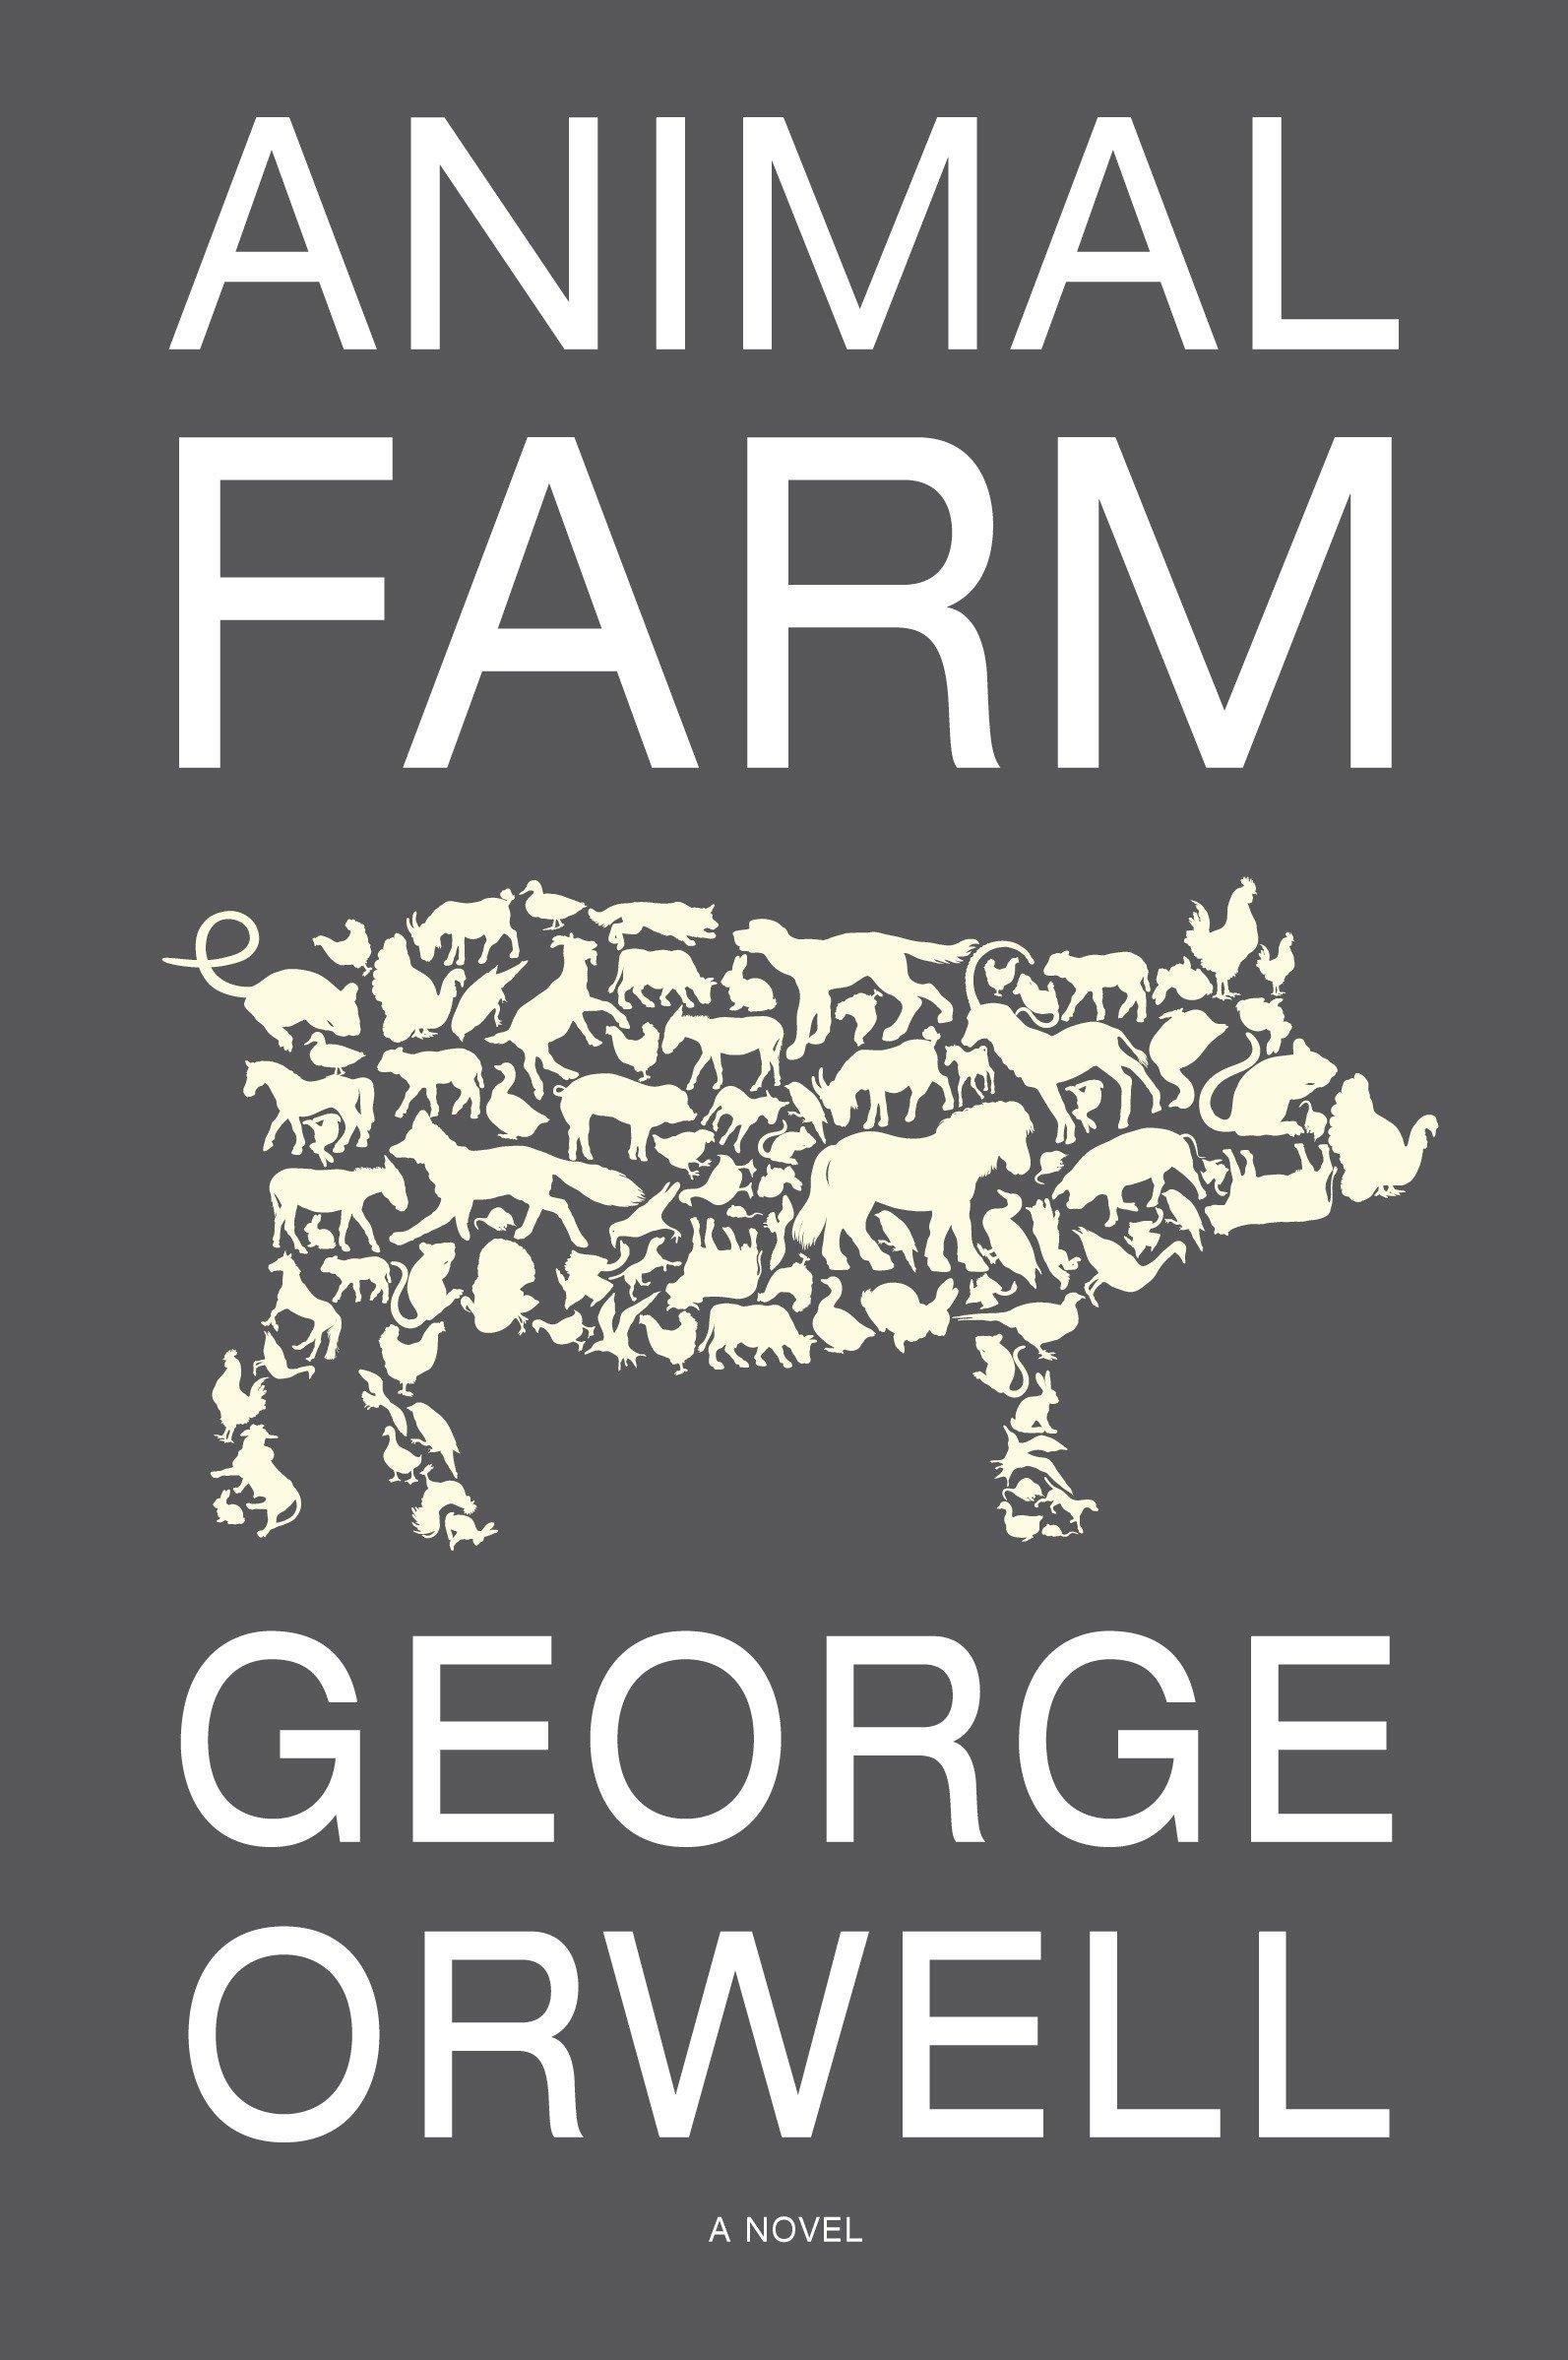 Animal Farm A Fairy Story George Orwell Russell Baker